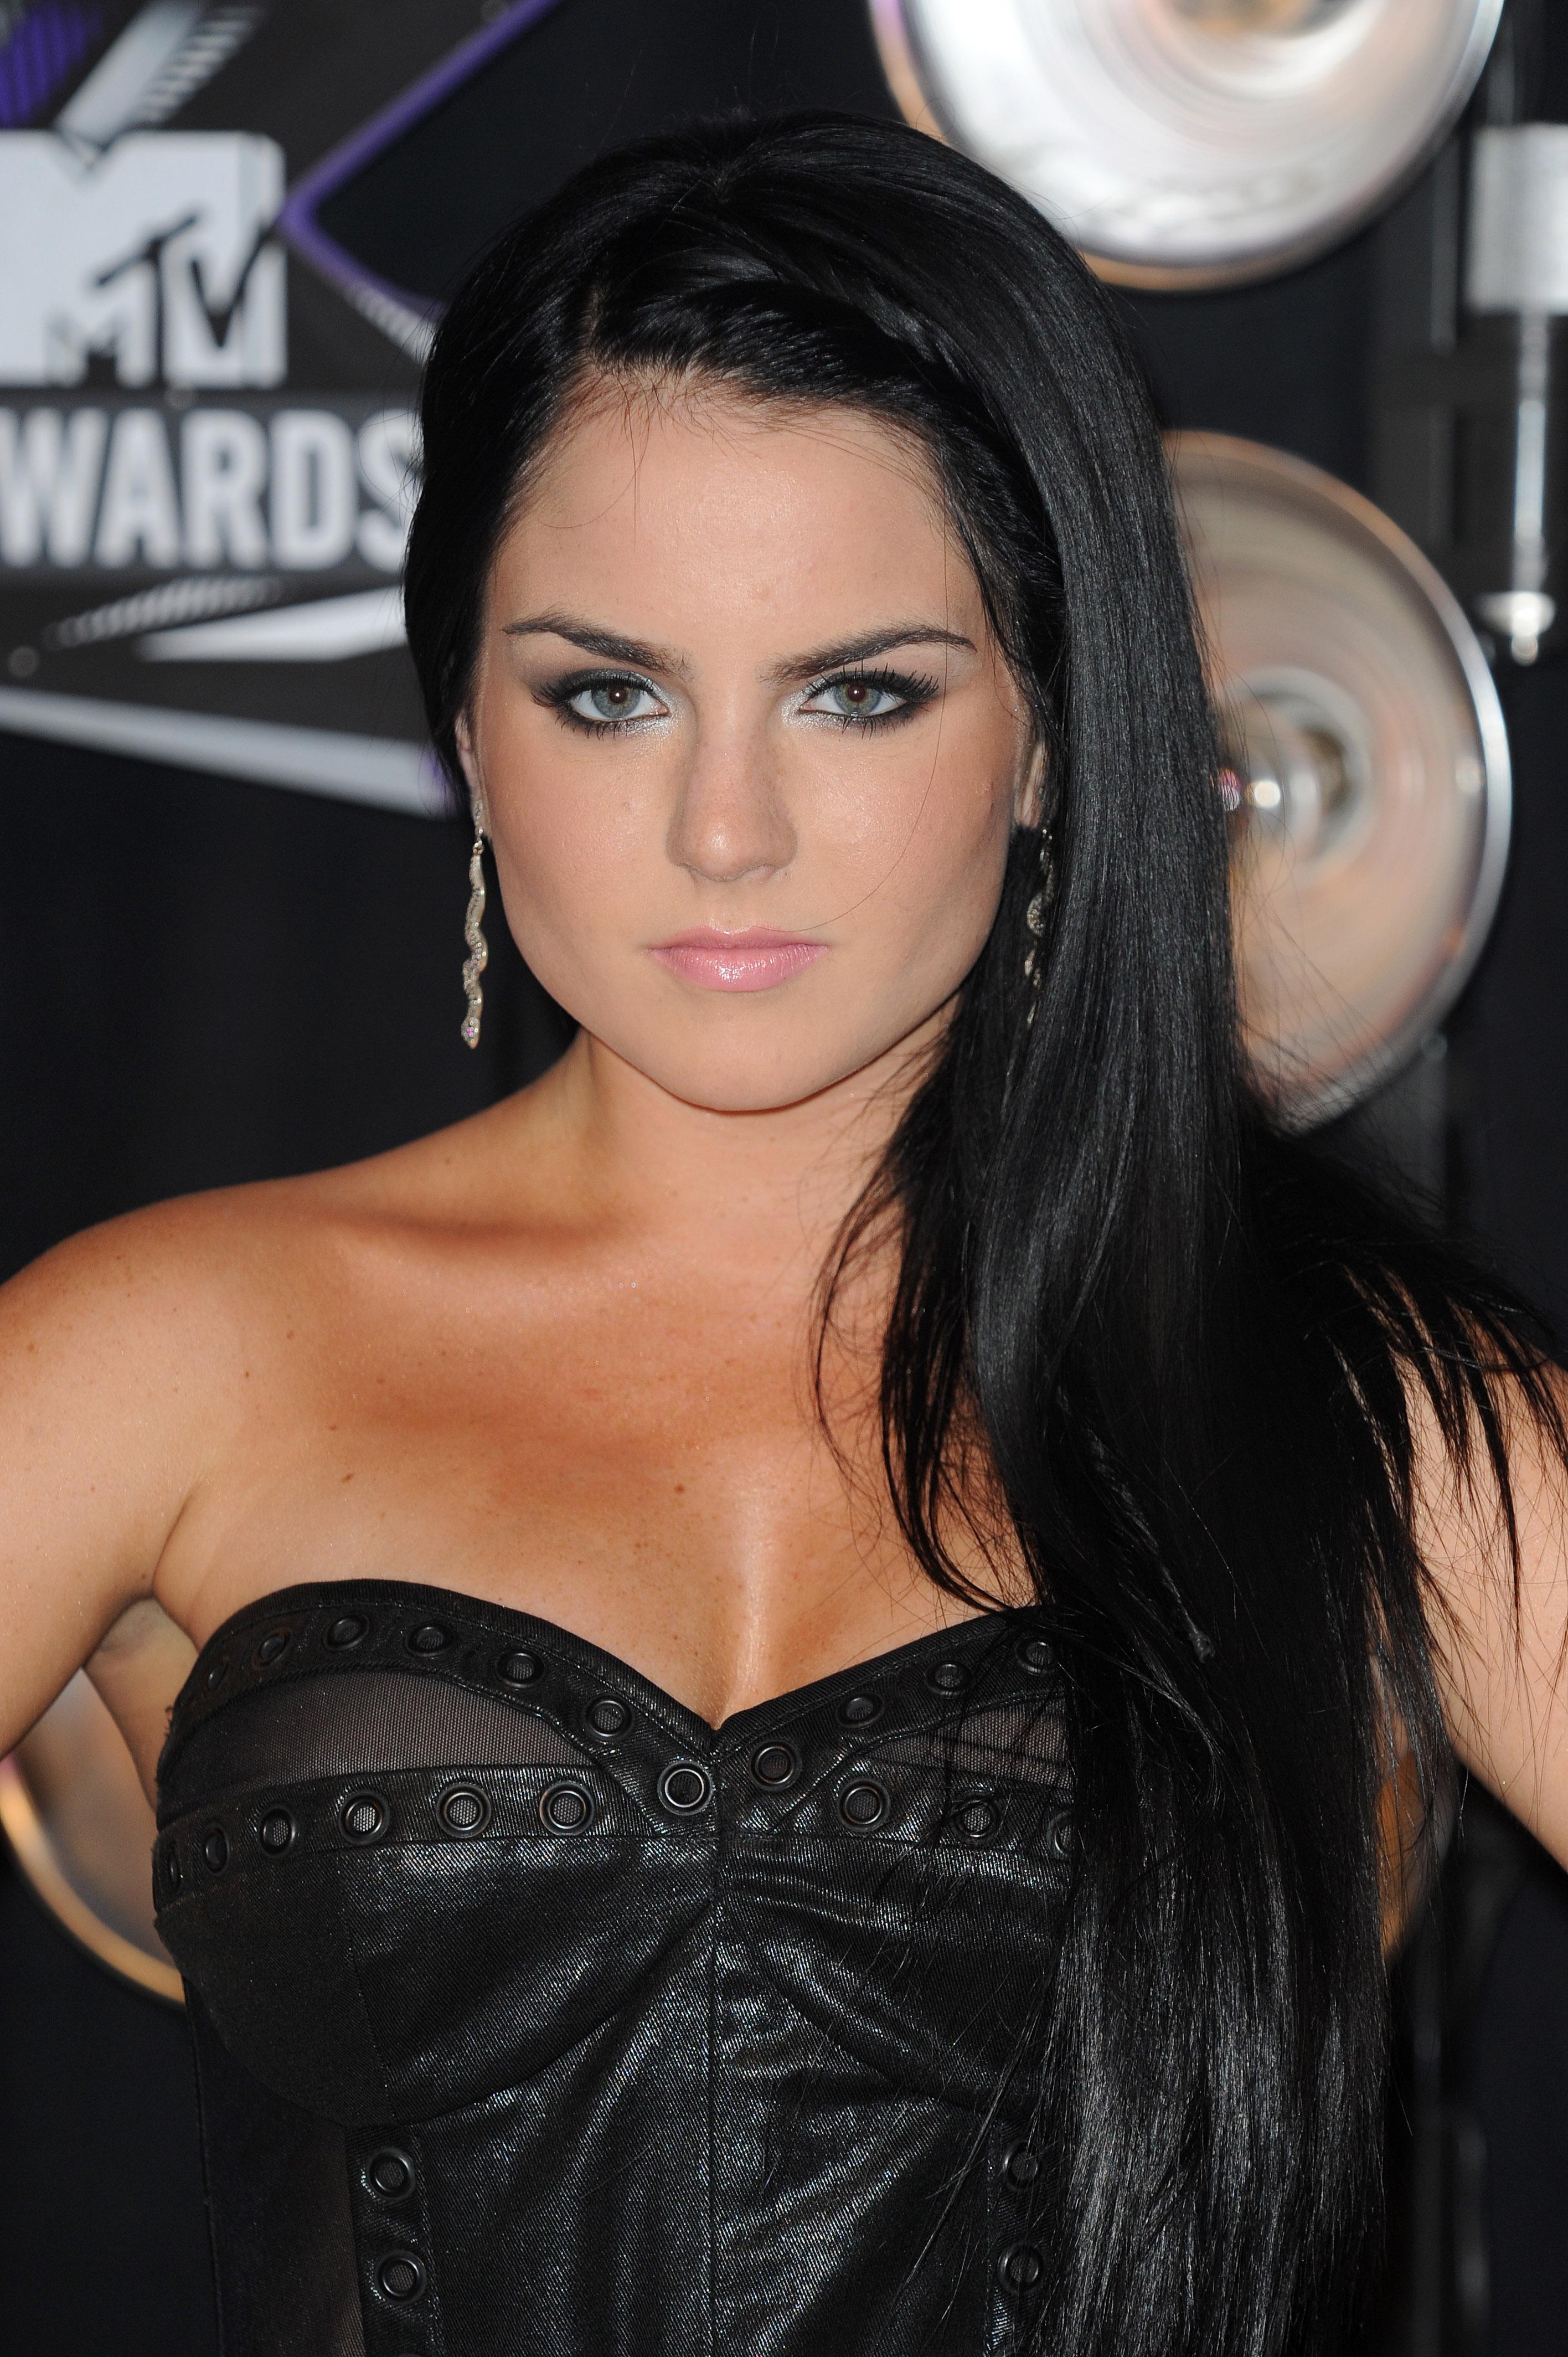 658146469_UploadedByKurupt_JoJo_MTV_Video_Music_Awards_in_Los_Angeles_ADDS_11_122_1194lo.jpg